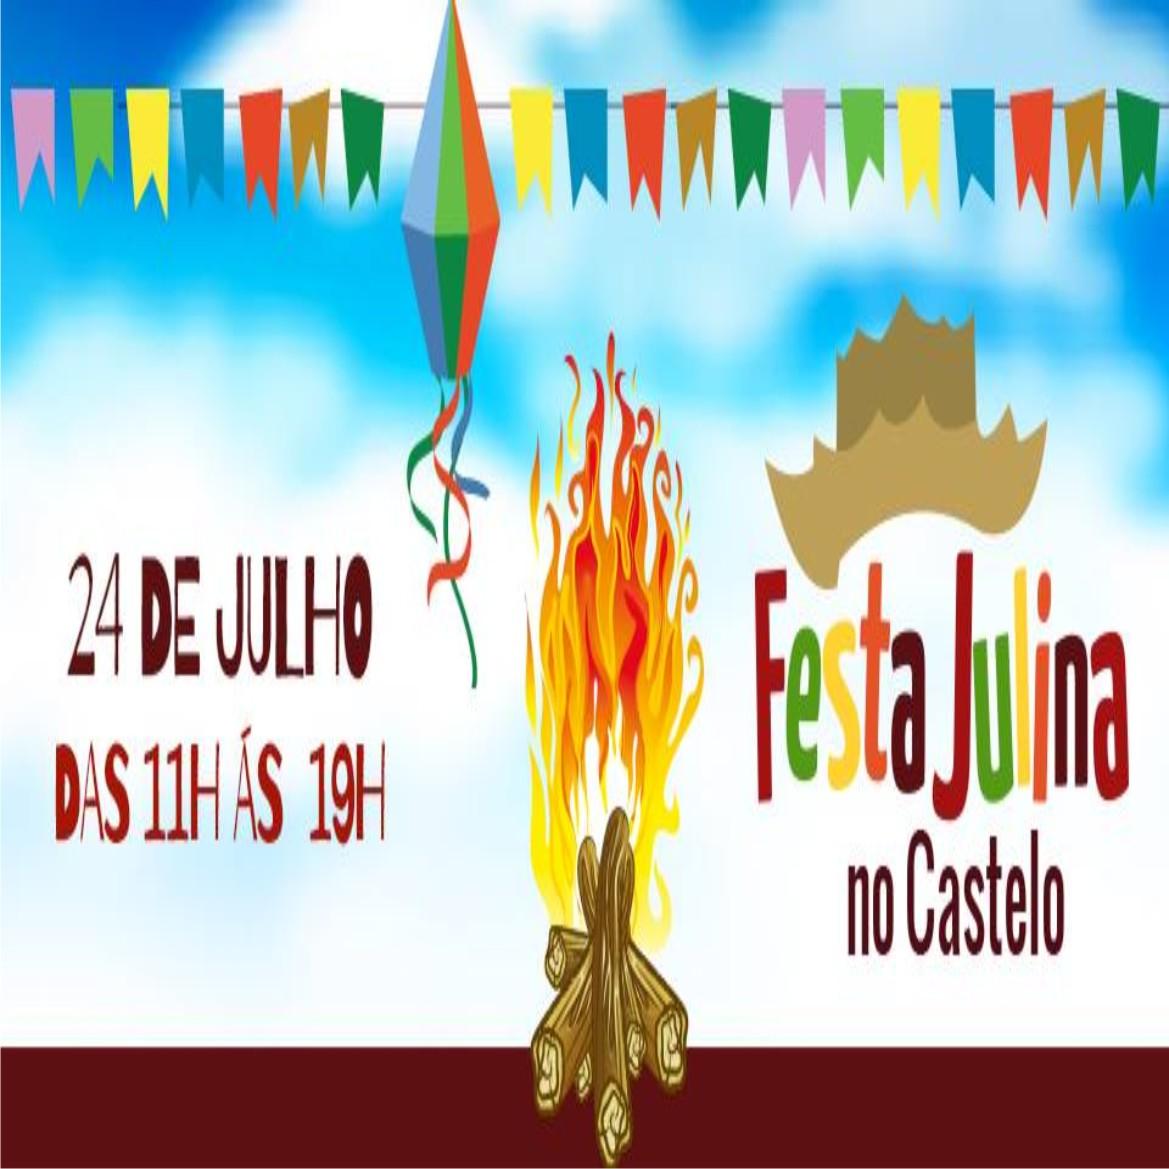 Festa Julina no Castelo de Itaipava